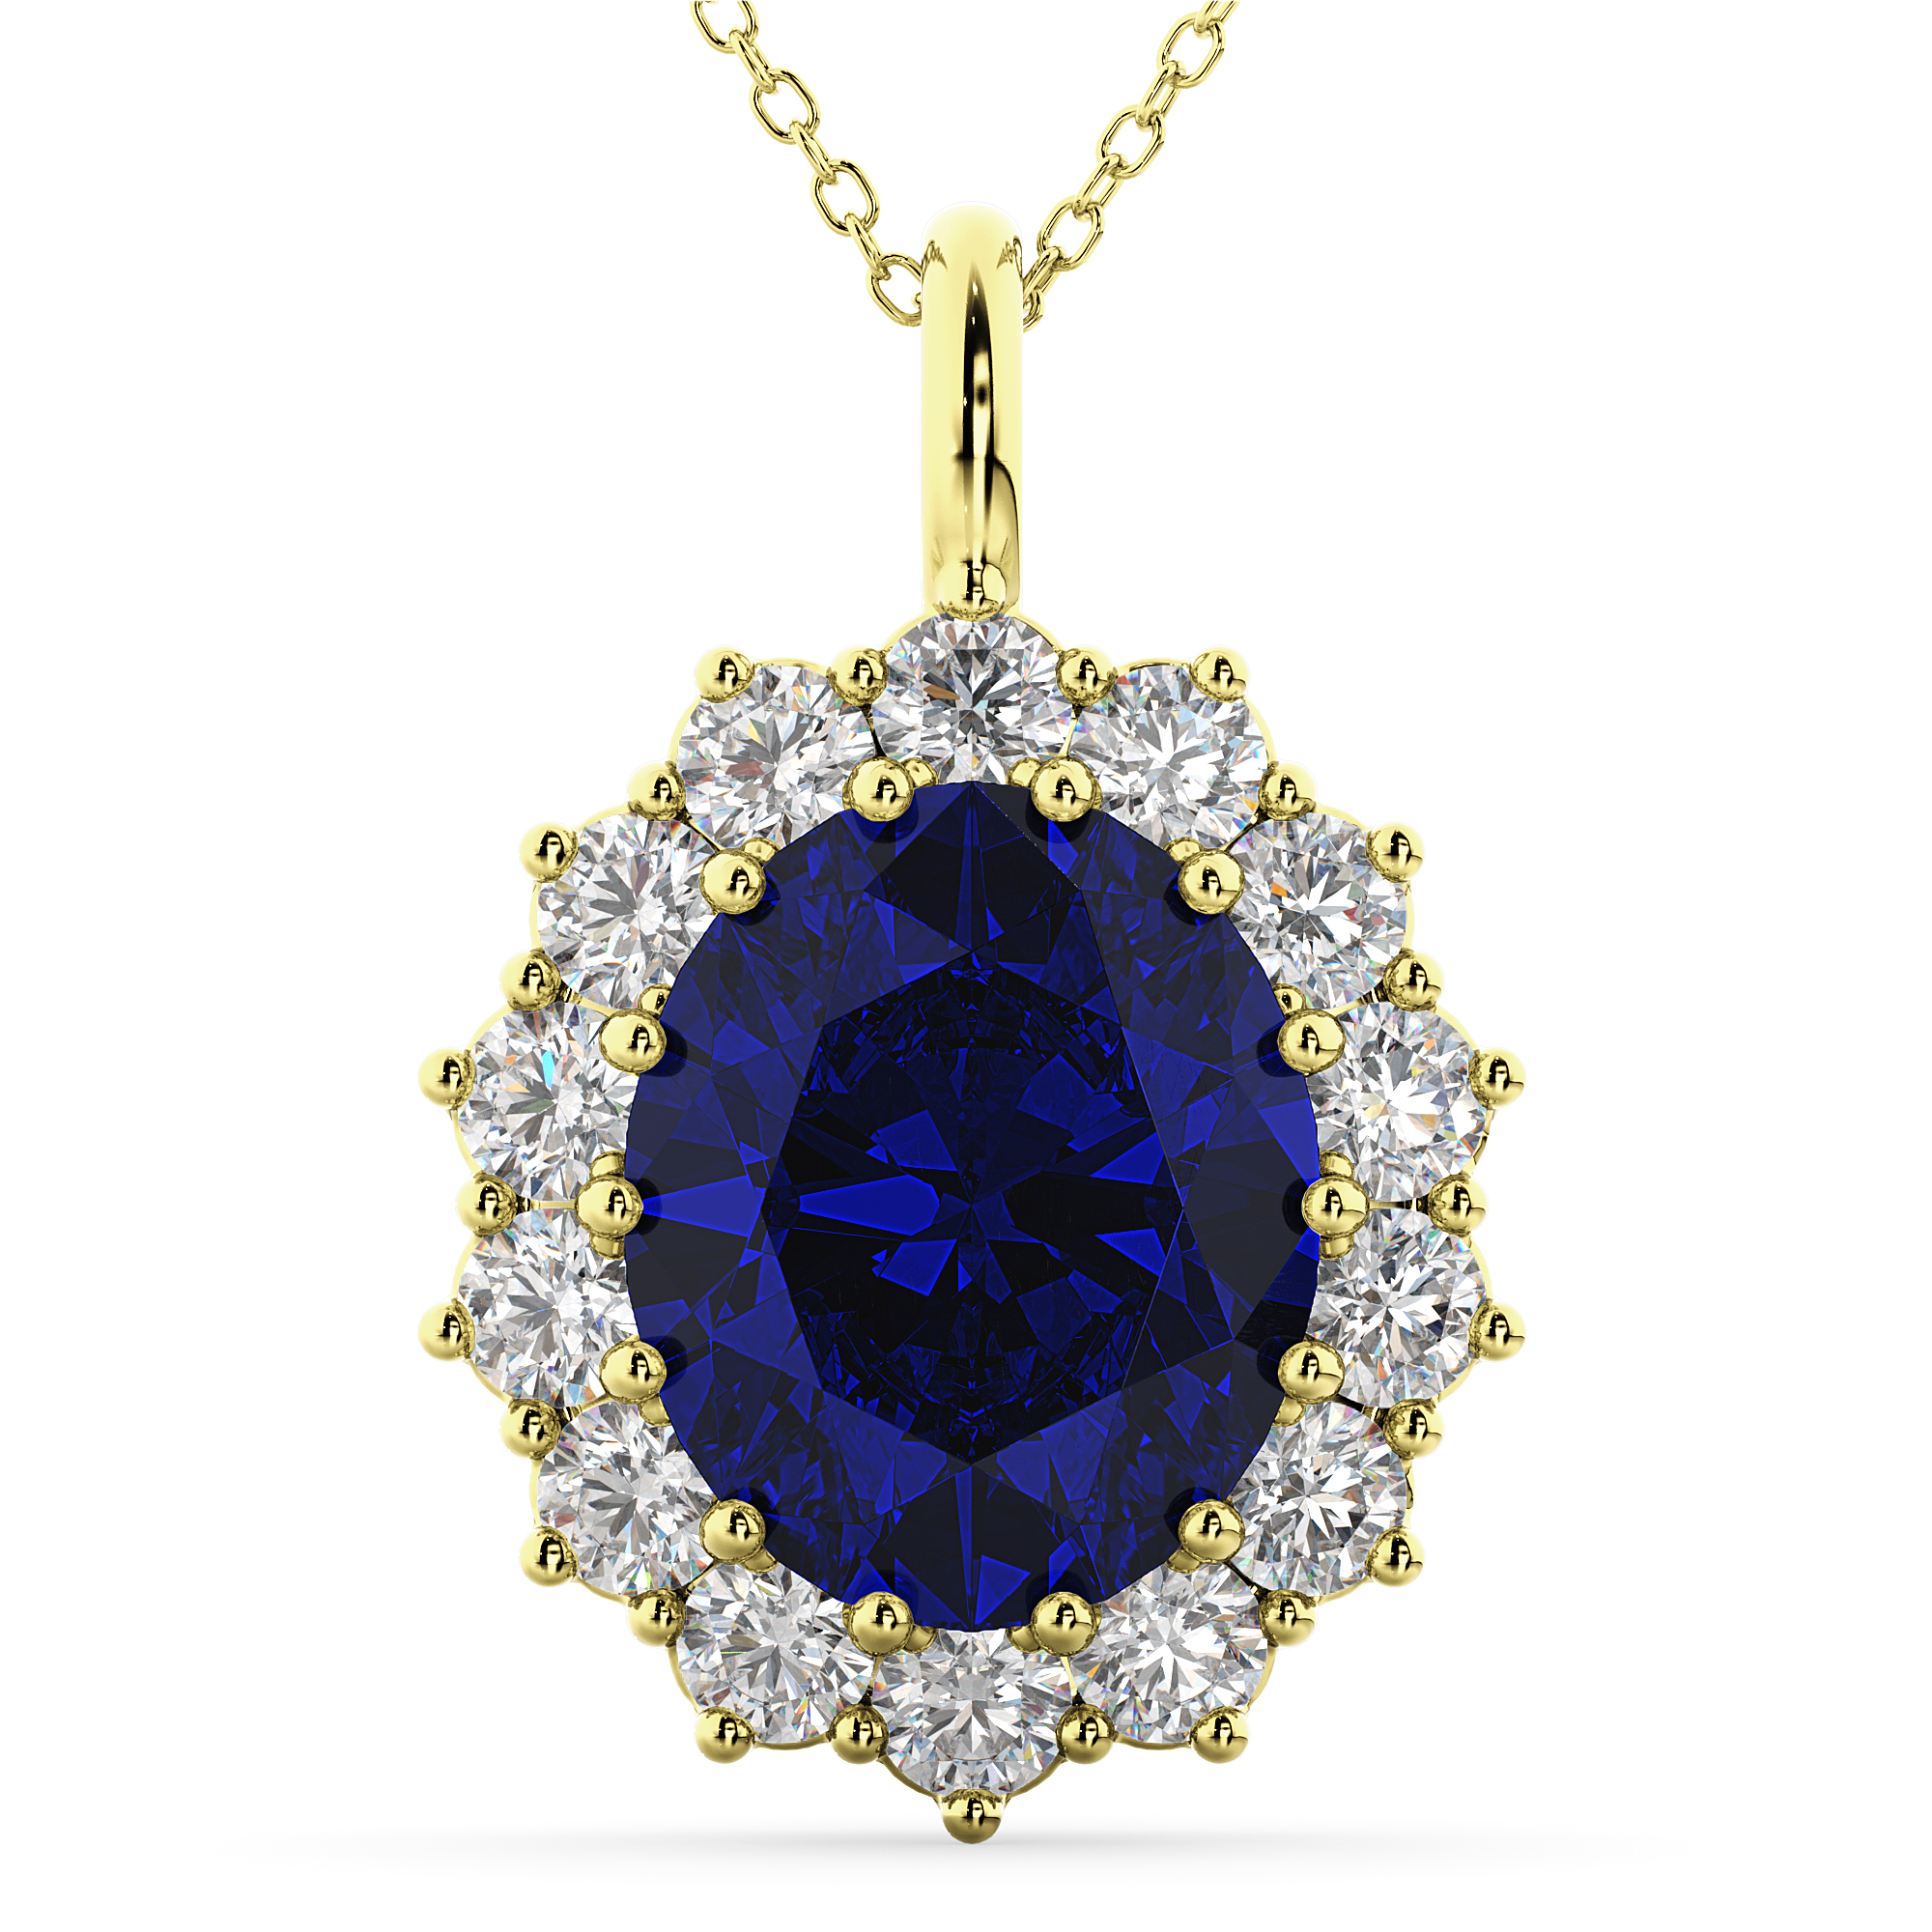 Oval Blue Sapphire Amp Diamond Halo Pendant Necklace 14k